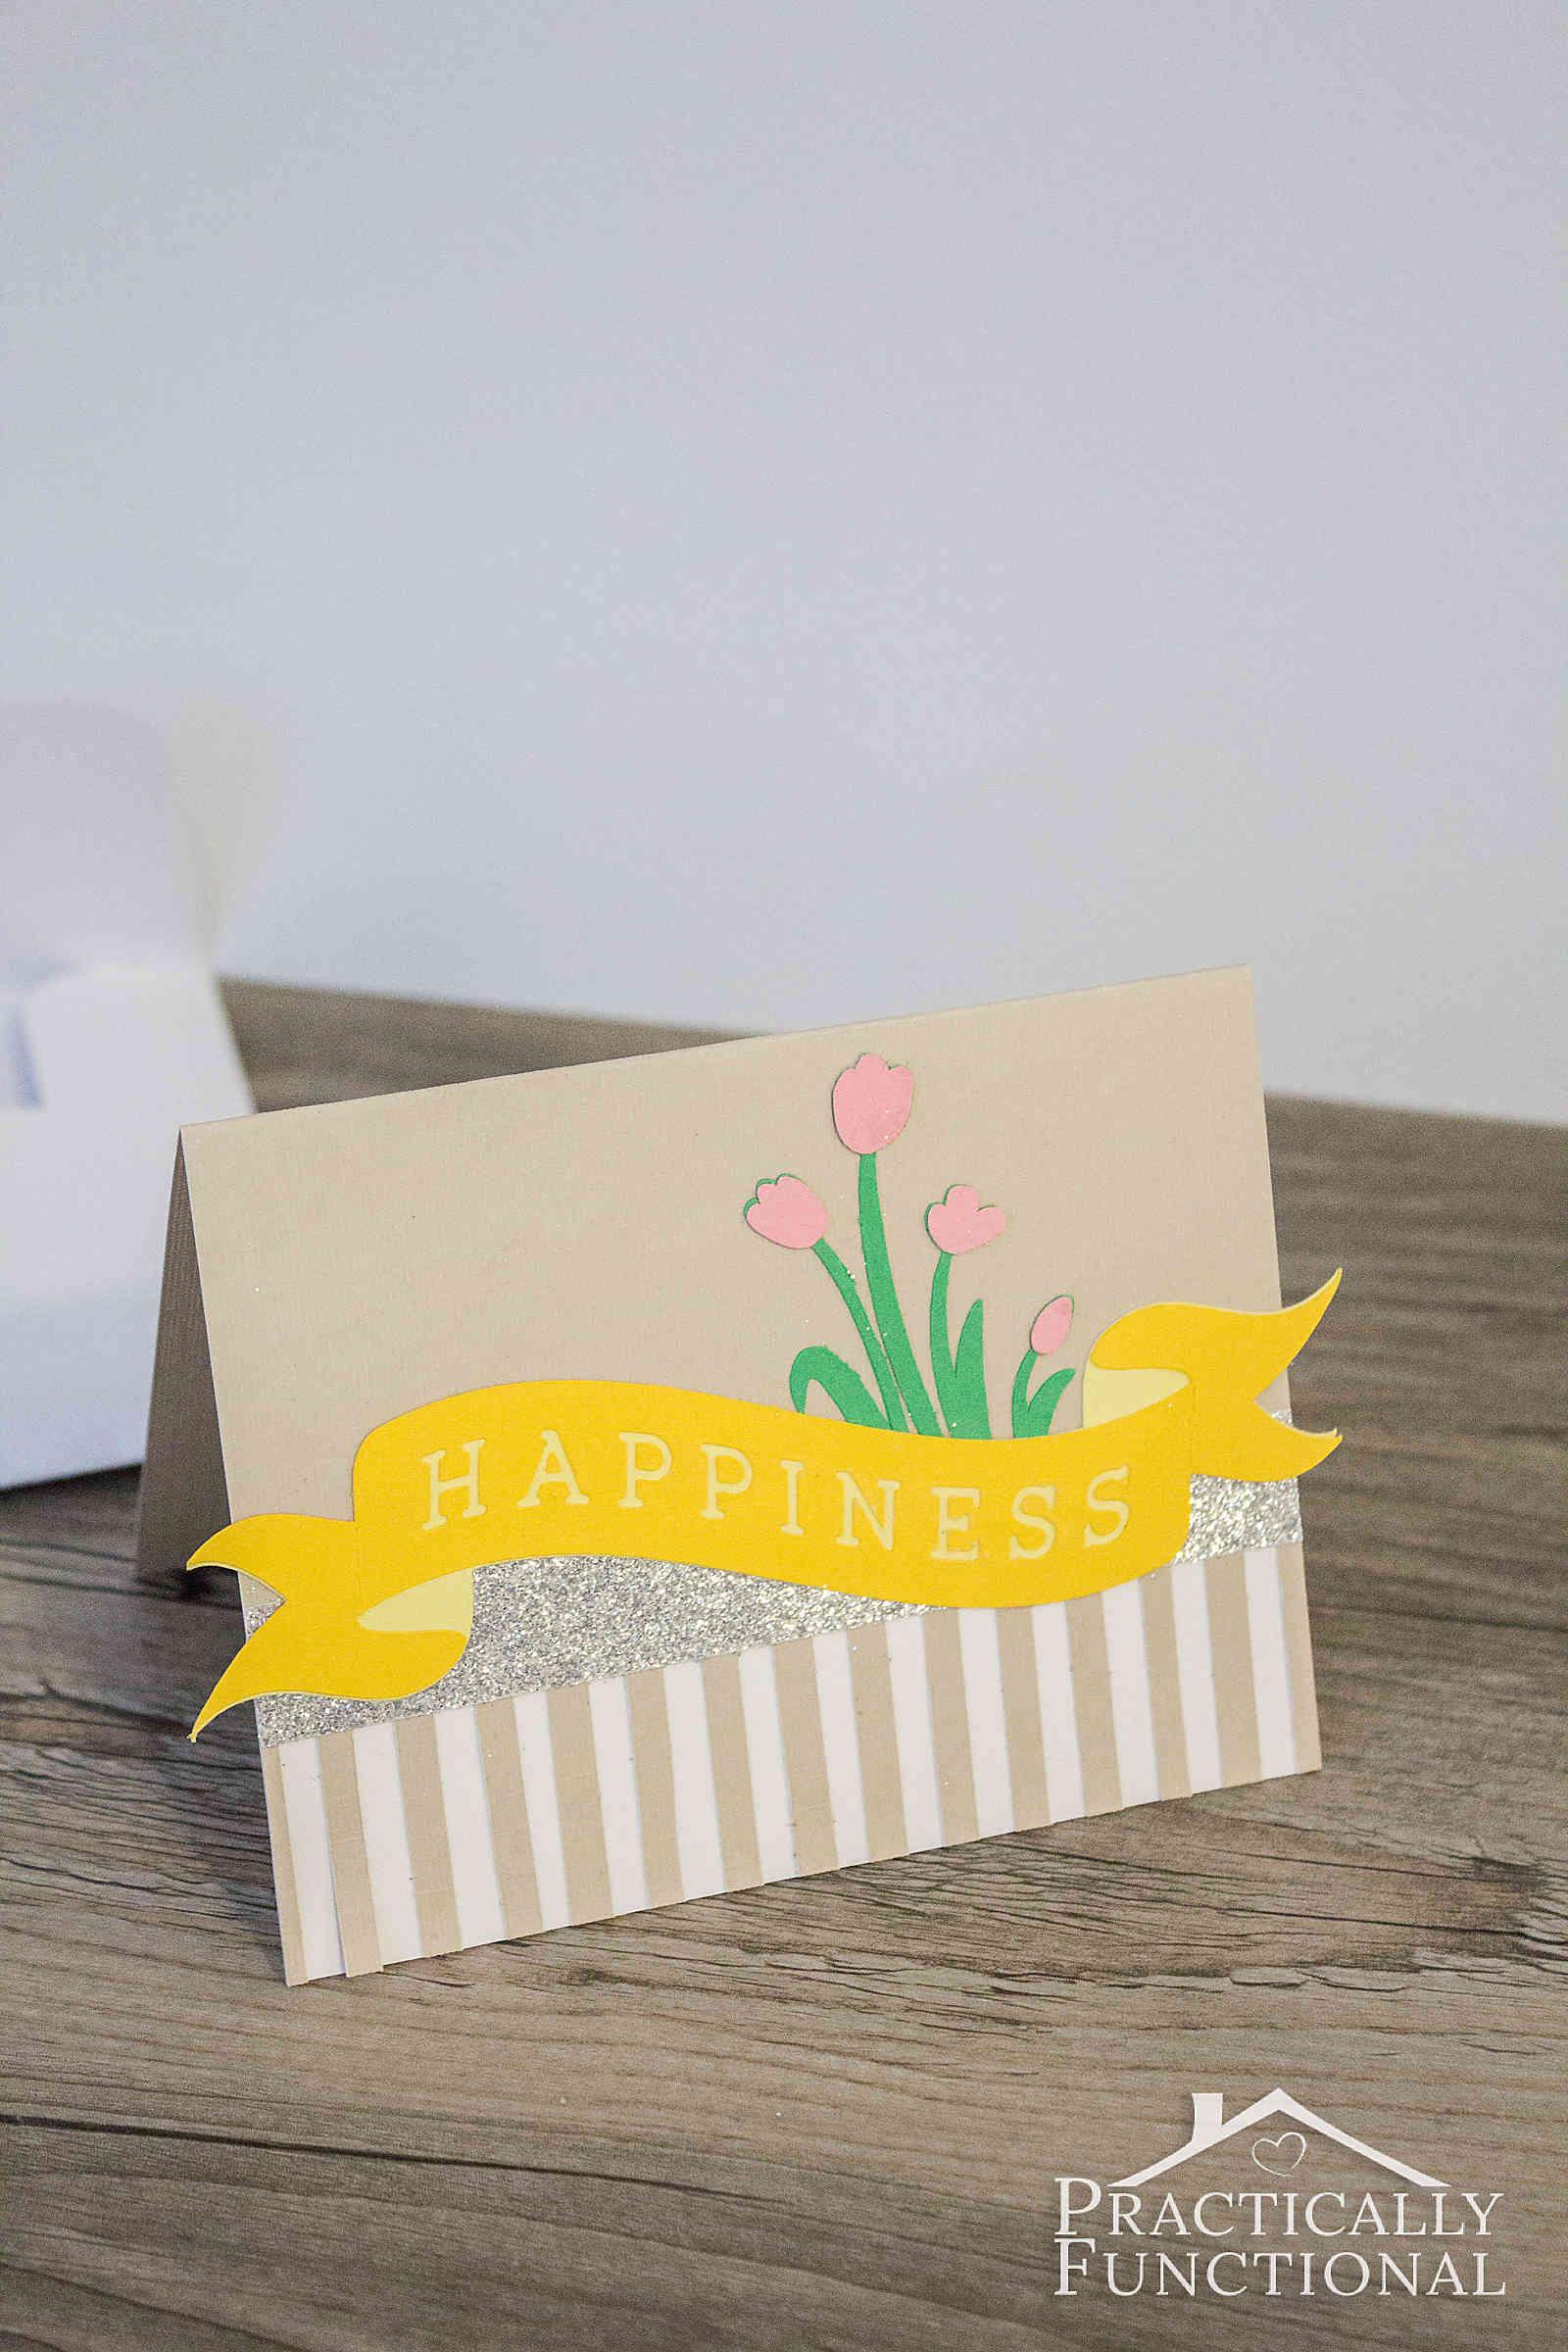 Make a cute Happiness card in under 20 minutes with a Cricut cutting machine!